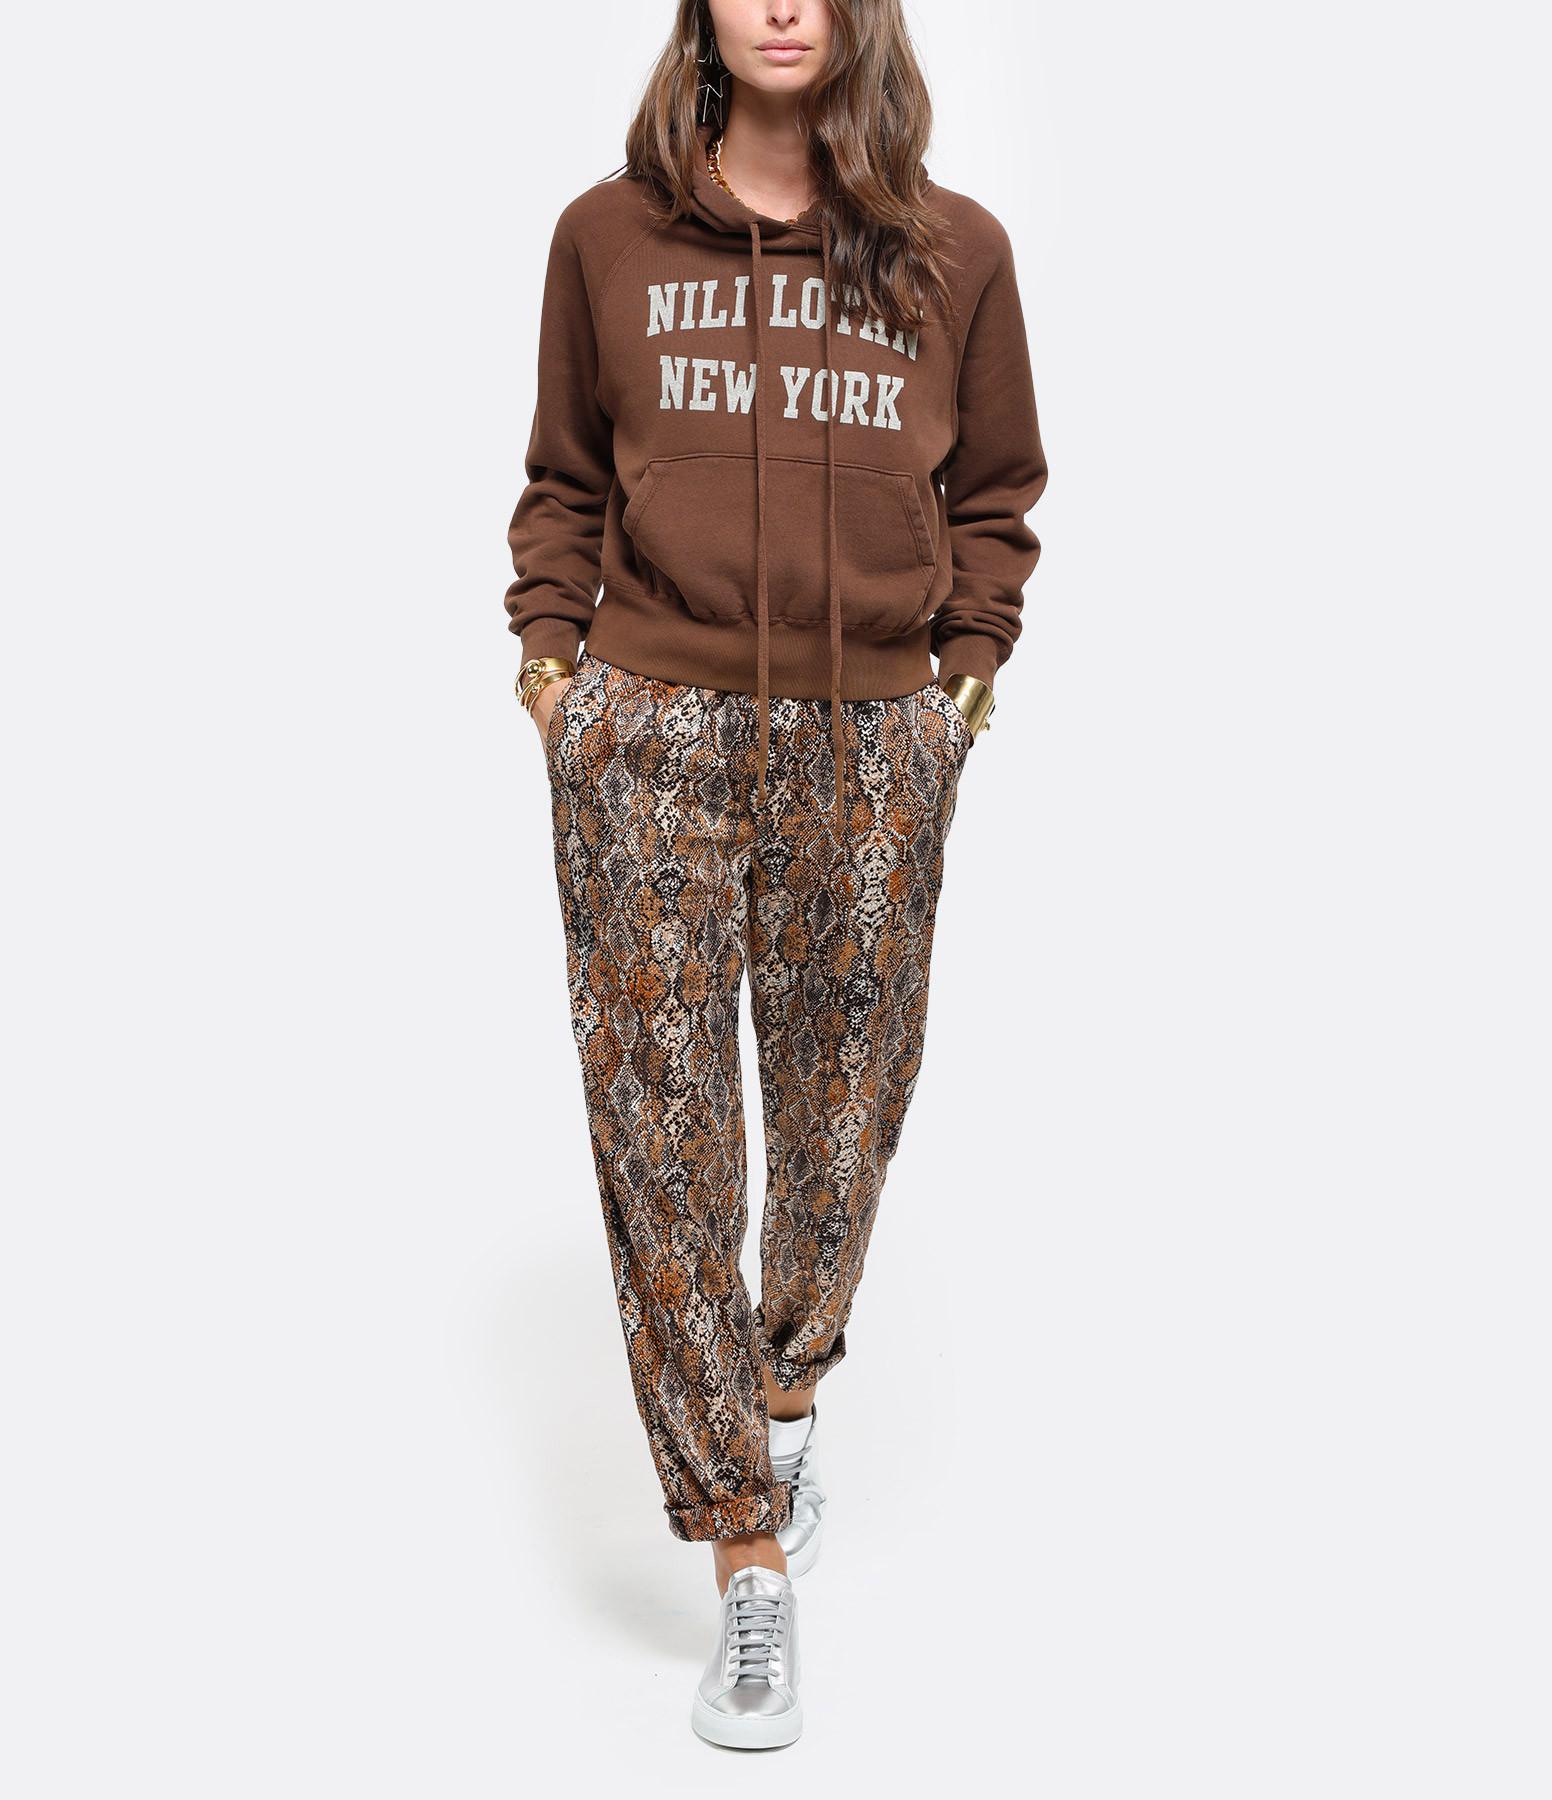 OVERLOVER - Pantalon Yucca Coton Ambre